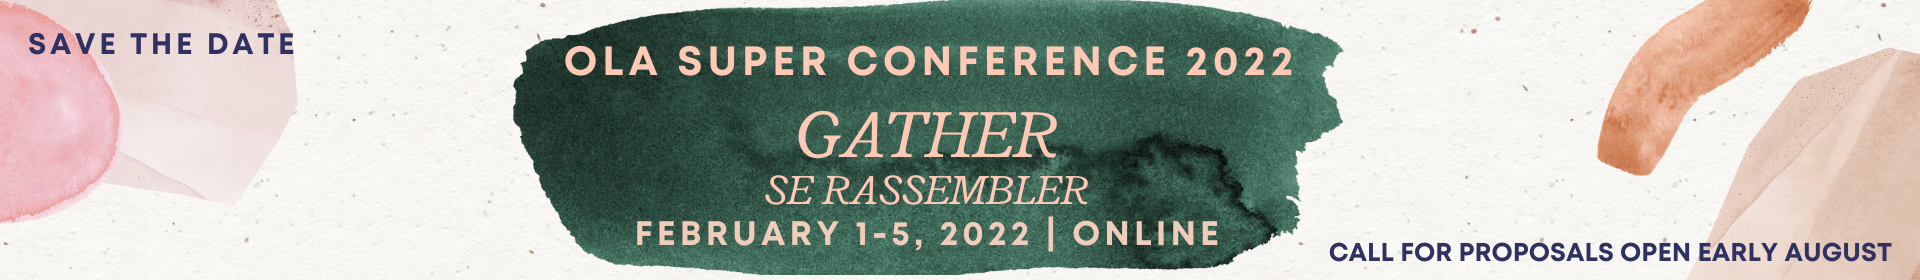 OLA Super Conference 2022 Event Banner